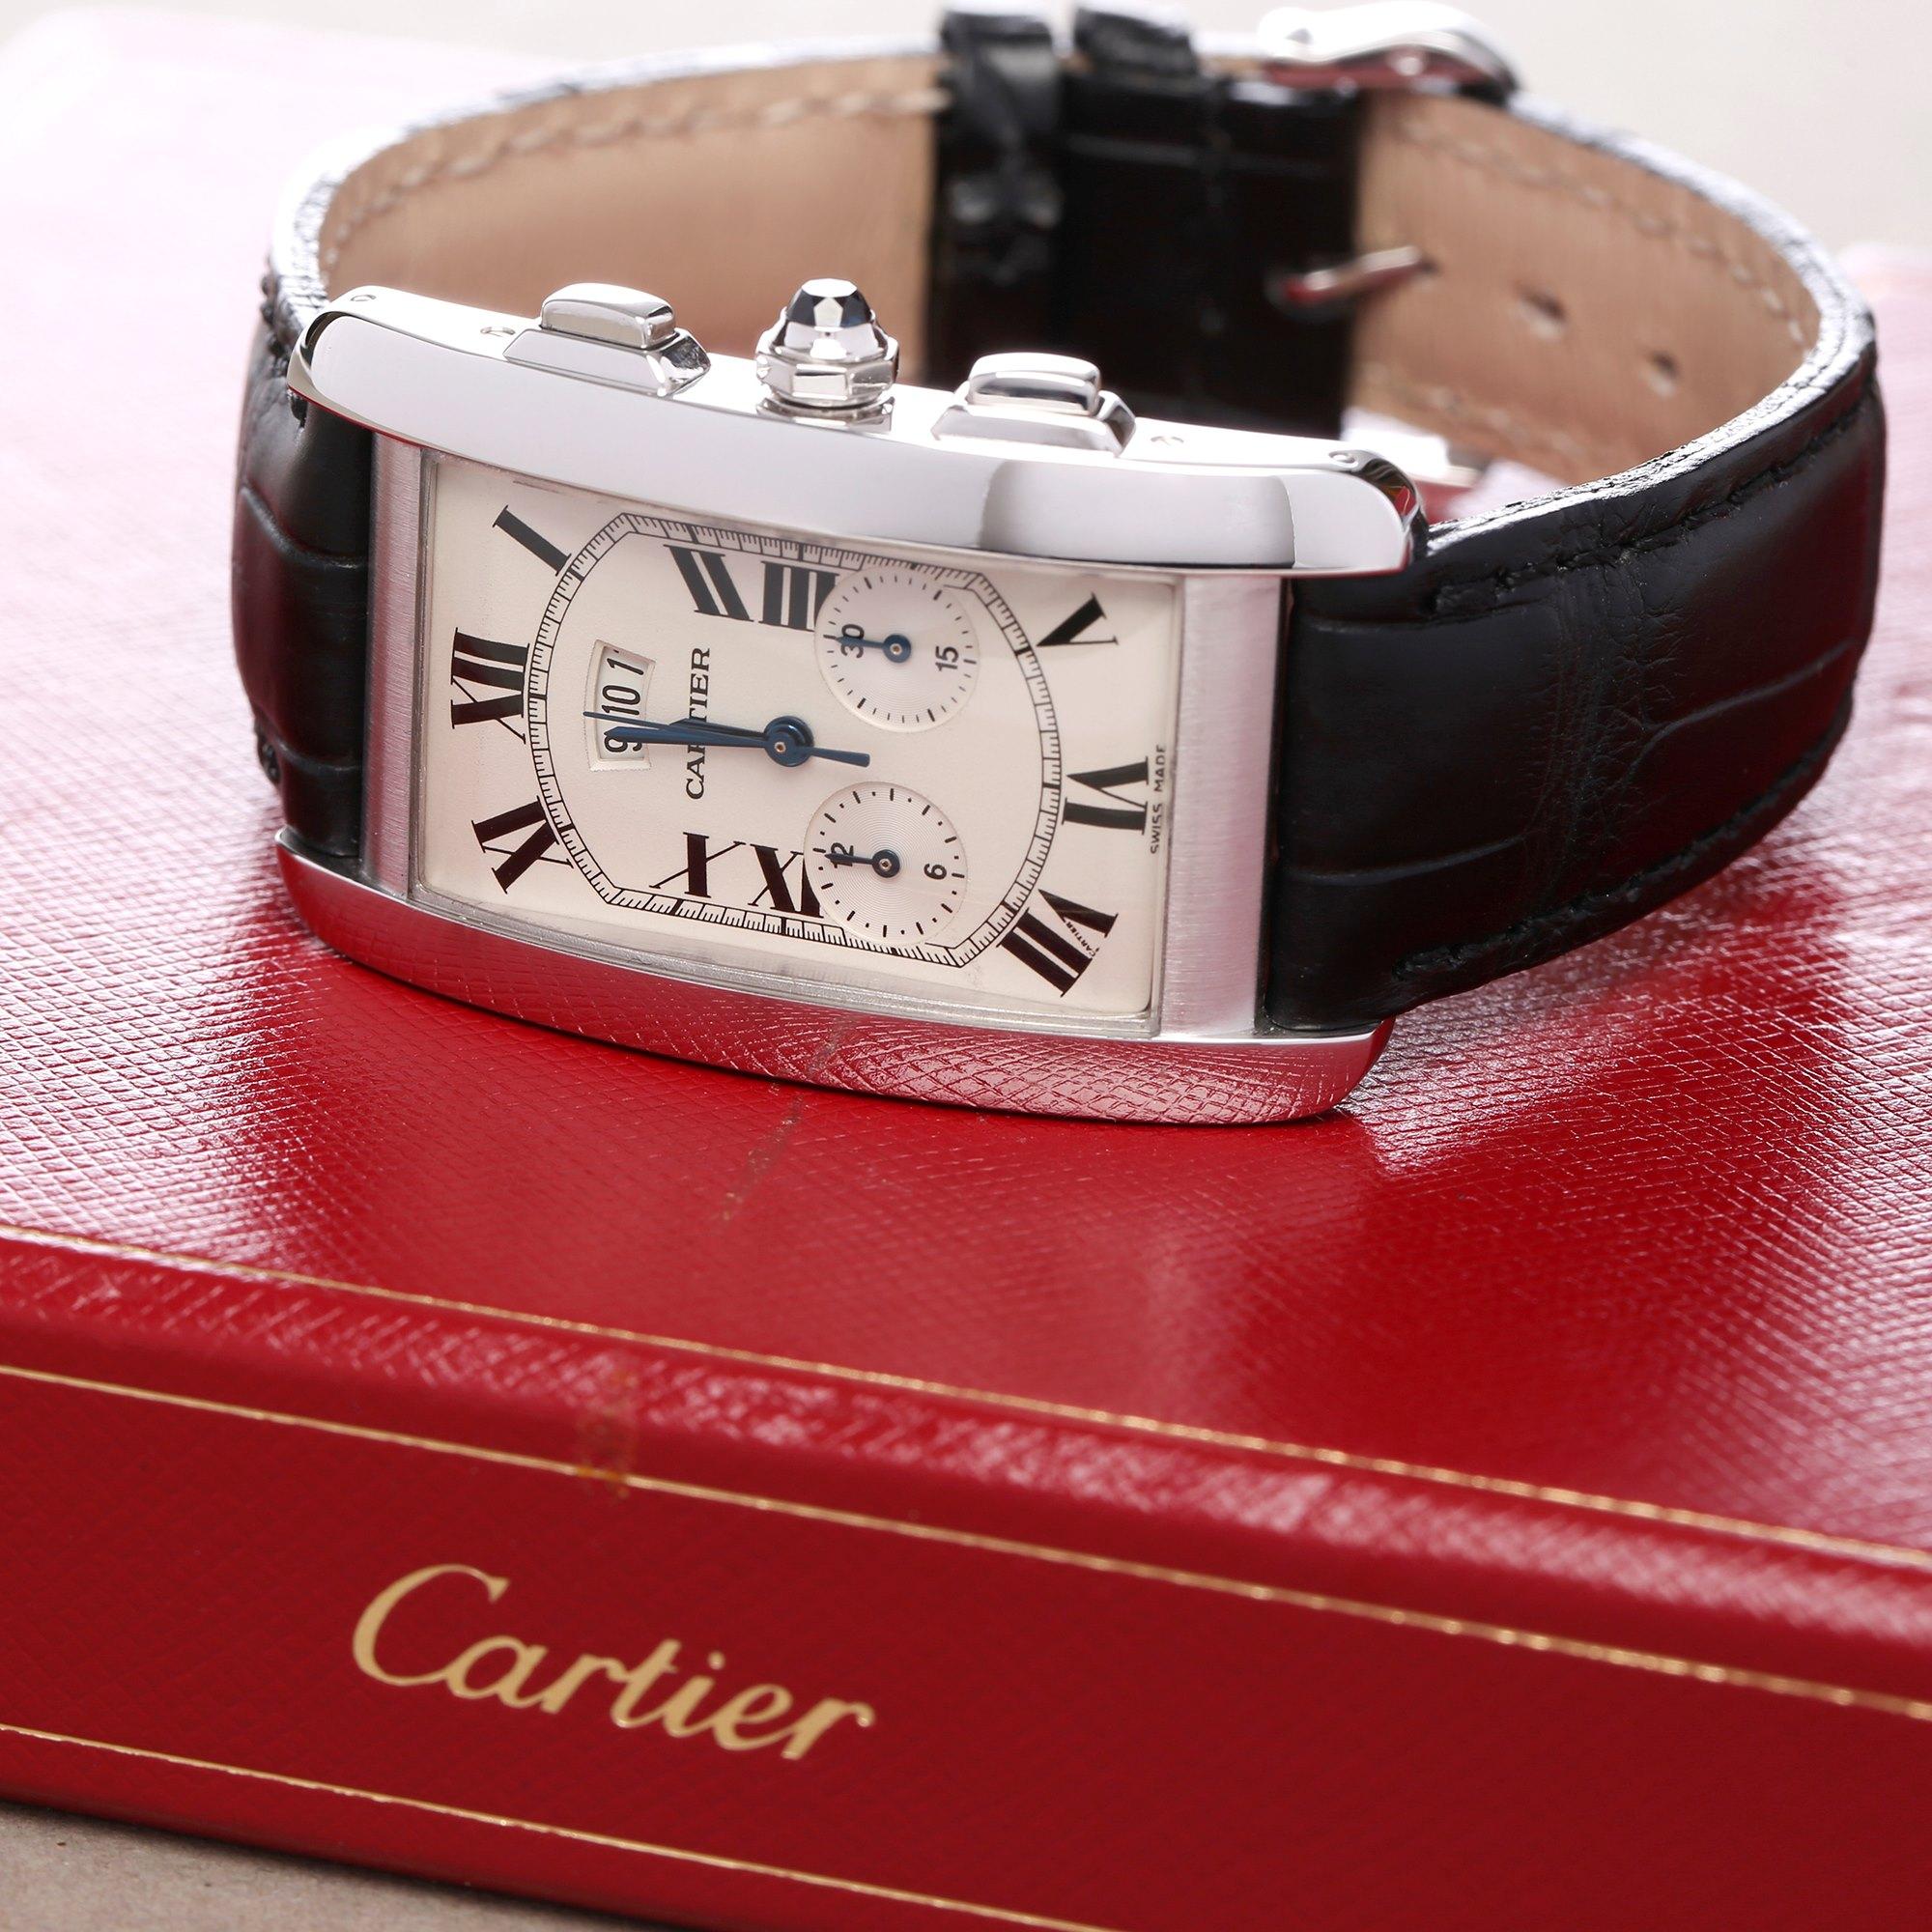 Cartier Tank Americaine Chronoreflex Chronograph 18K White Gold 2569